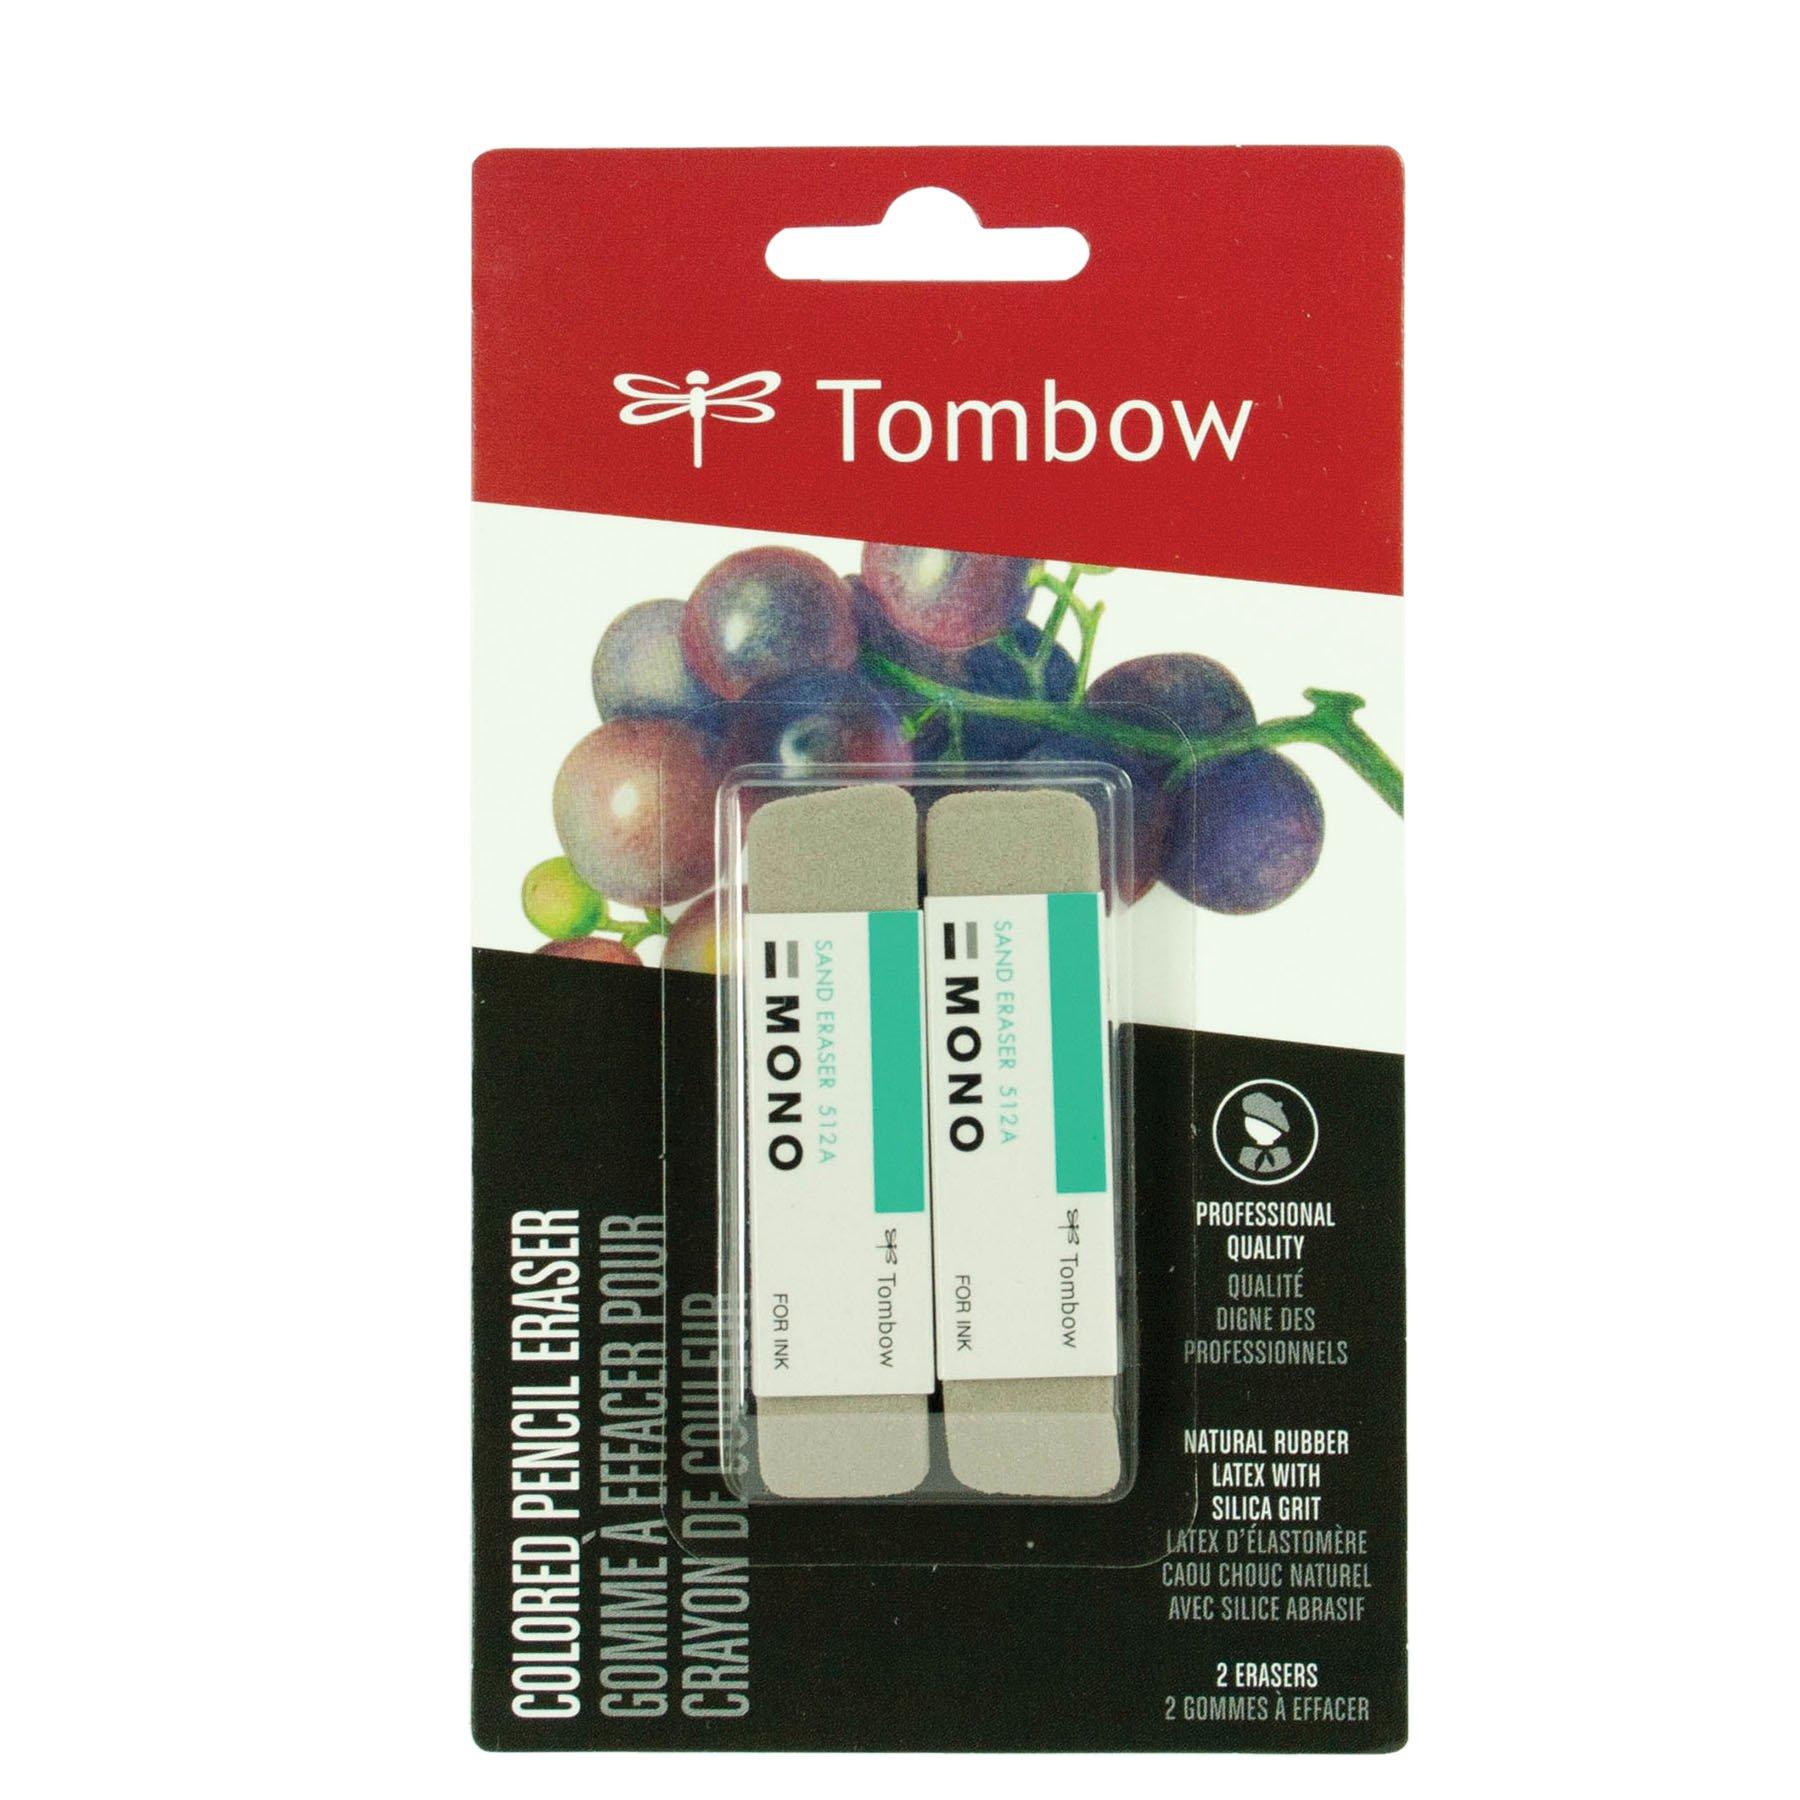 Tombow 67304 MONO Sand Eraser, 2-Pack. Silica Eraser...